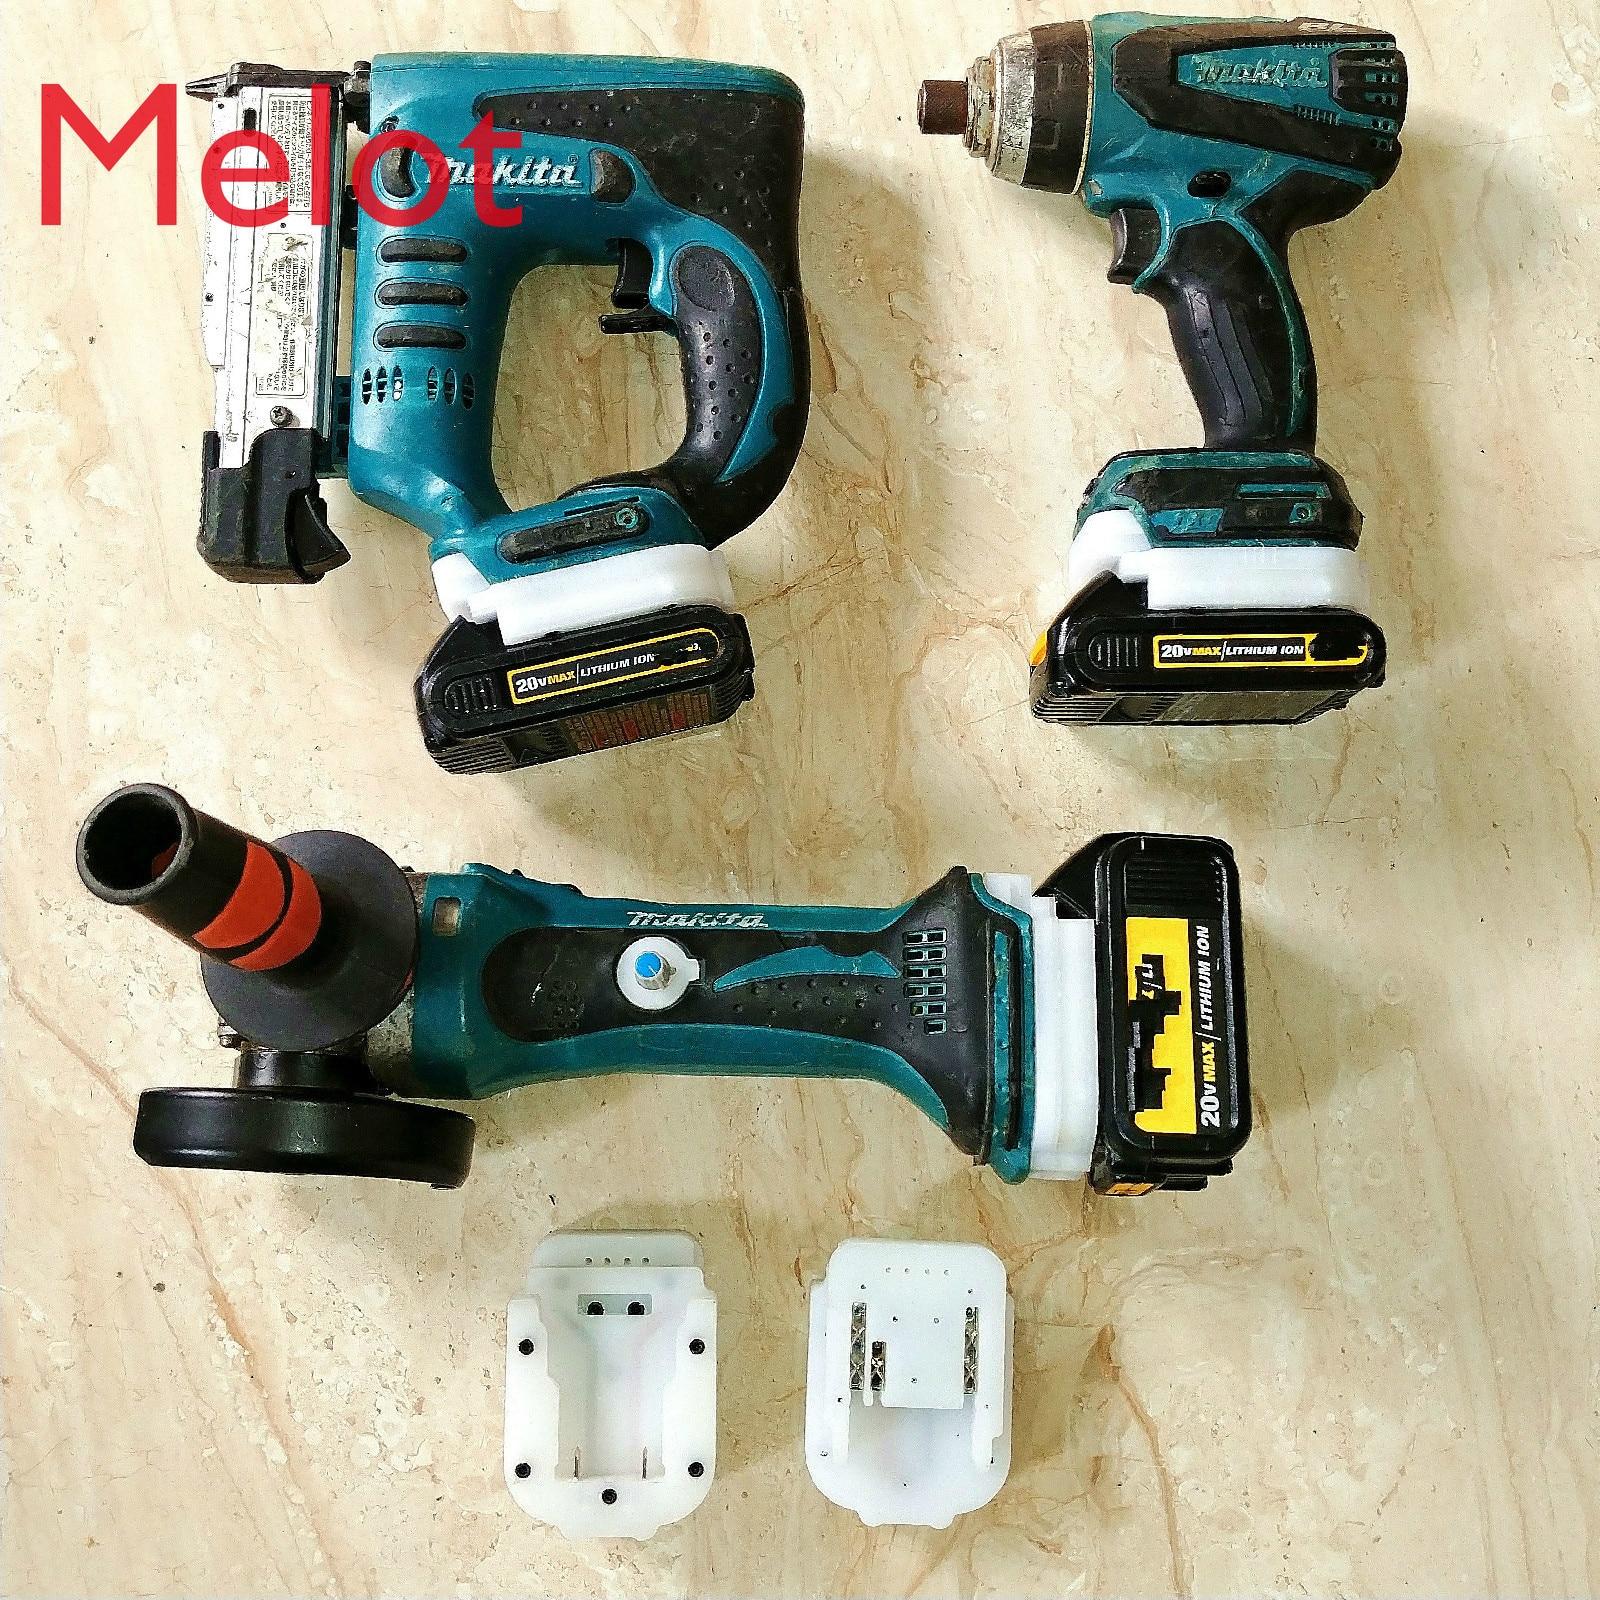 18v20v lithium battery power tools use battery adapter, used for  DeWalt Bosch Makitae AGE 20v60v electric tools lithium battery enlarge